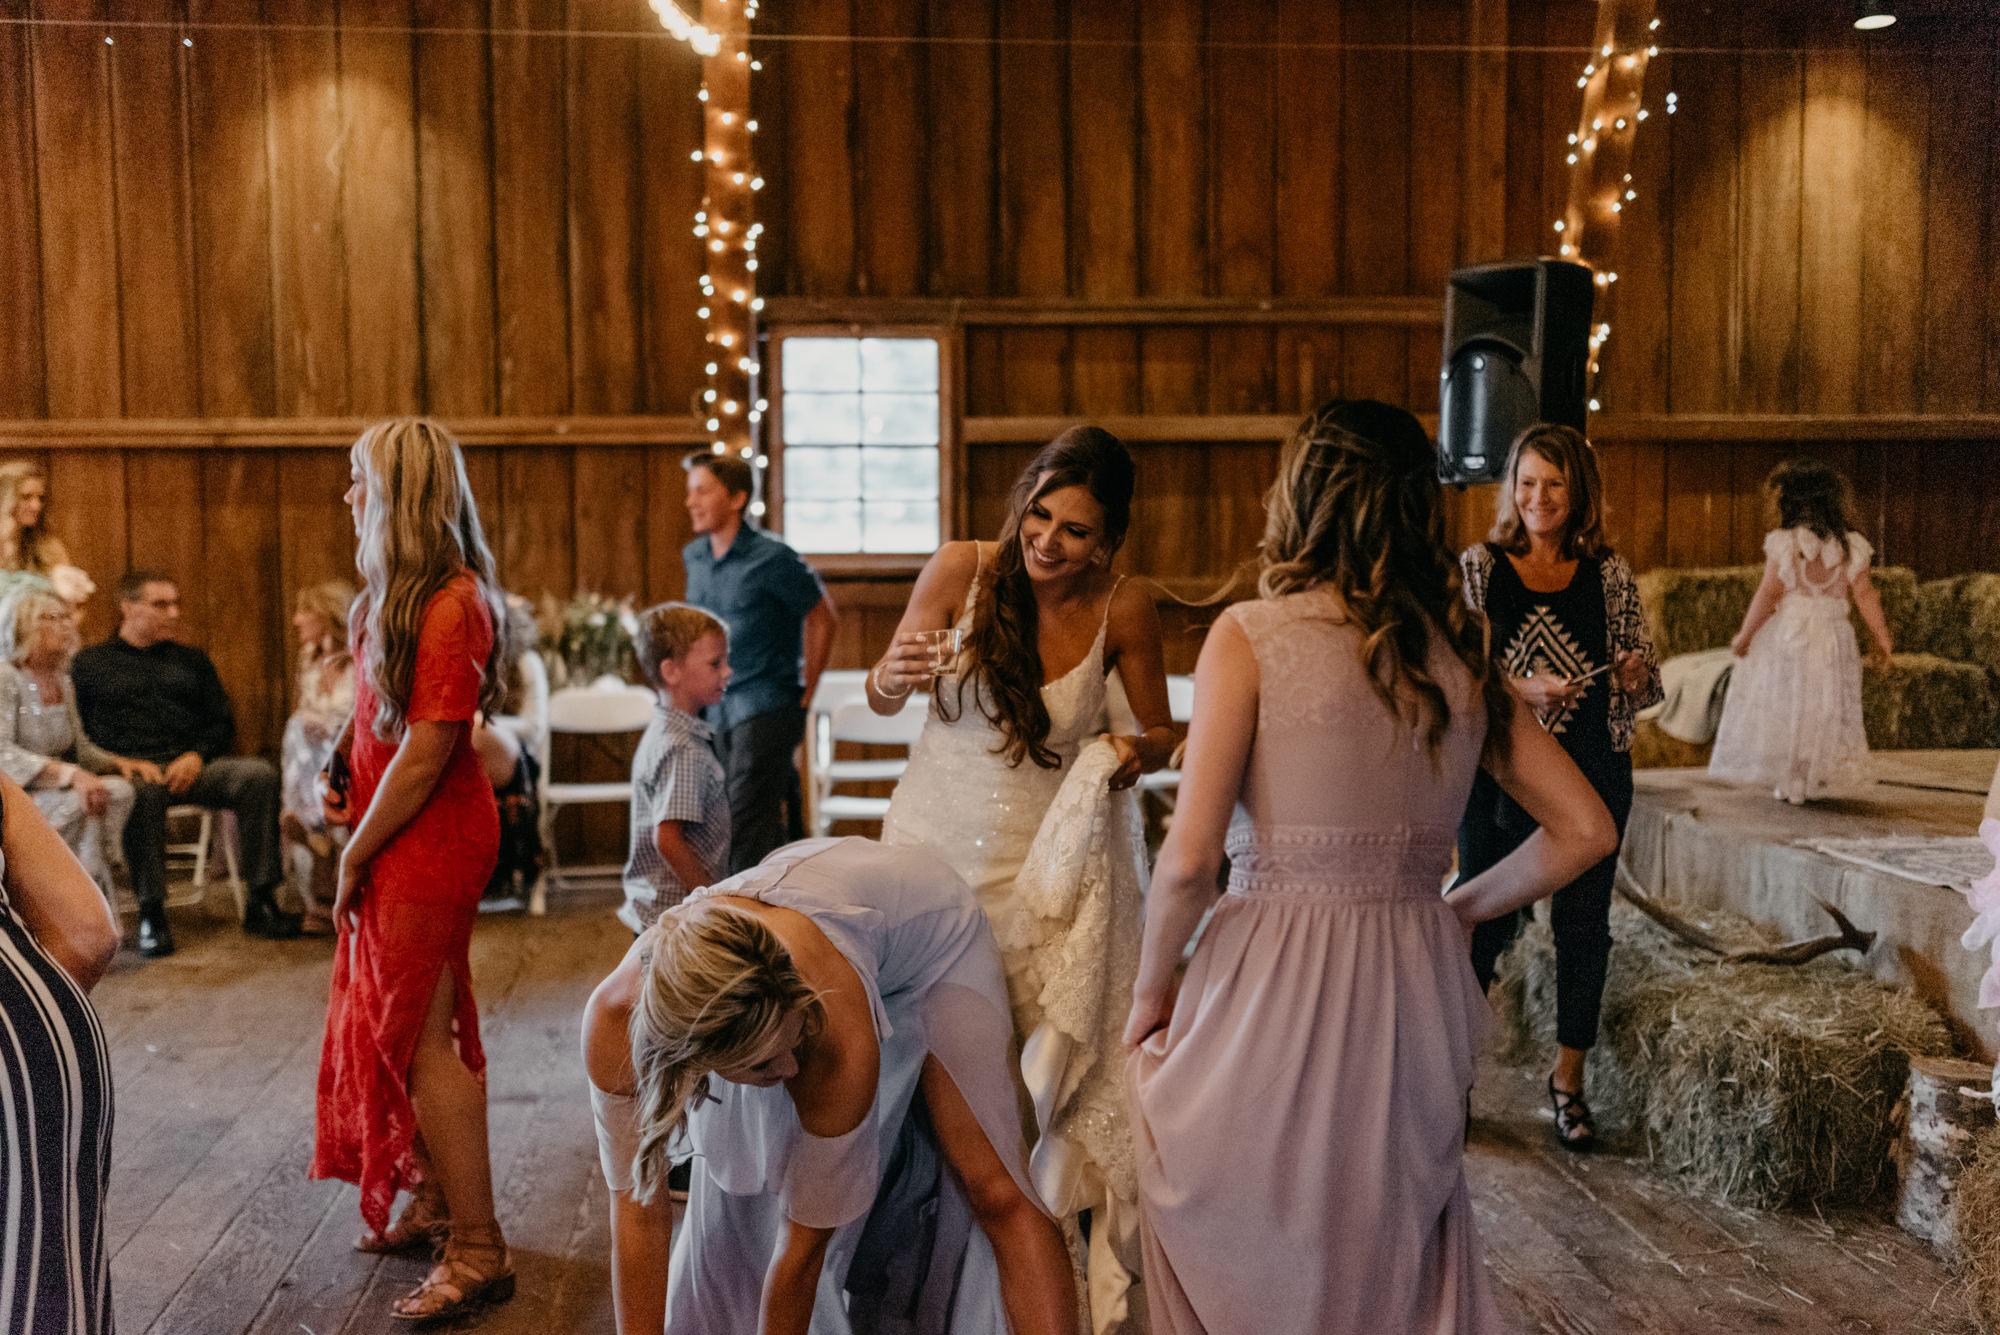 201-portland-northwest-wedding-bubble-exit-barn-string-lights.jpg